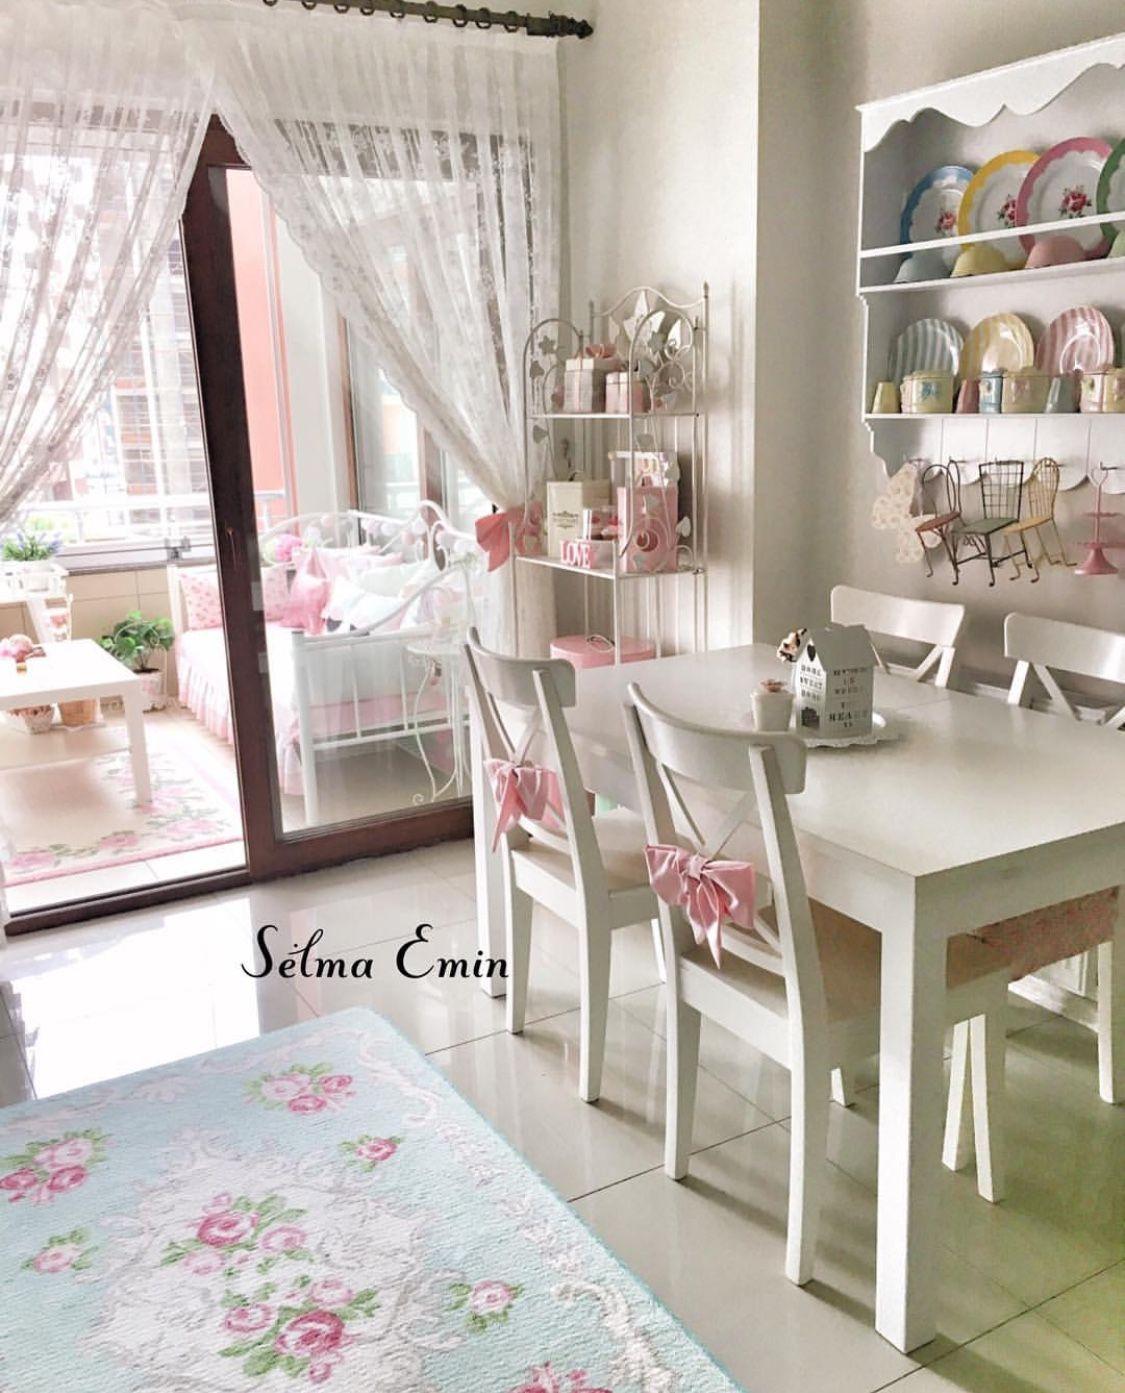 Shabby Chic Shelves Curtains Ruffled Dining Decor Kids Bedroom Shower